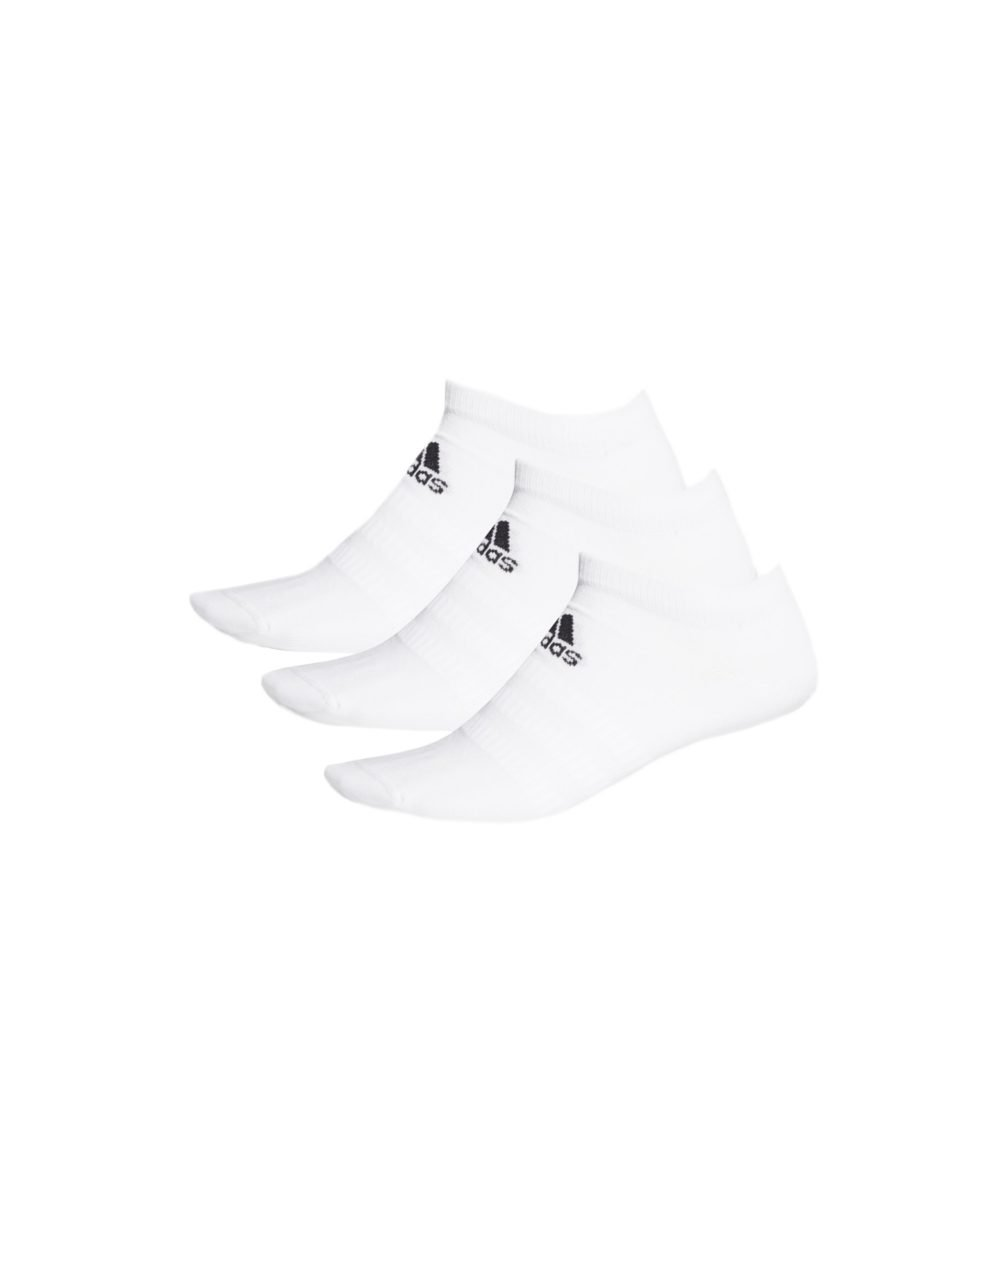 Adidas Light Low 3PP Sock (DZ9401) White